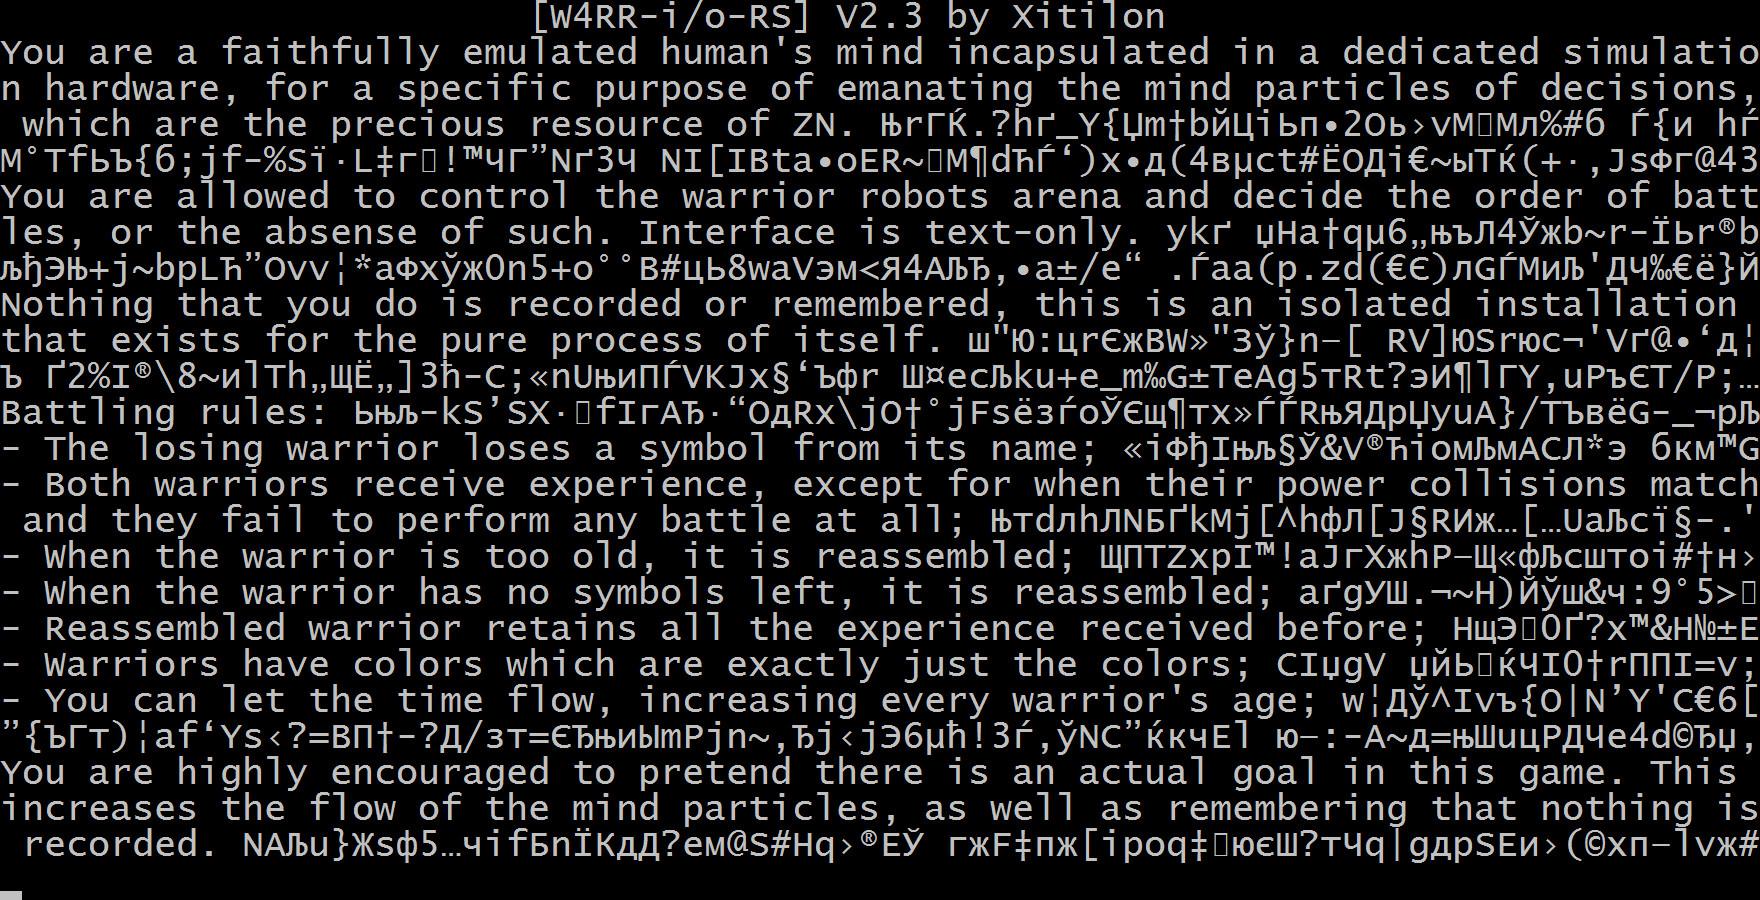 W4RR-i/o-RS screenshot